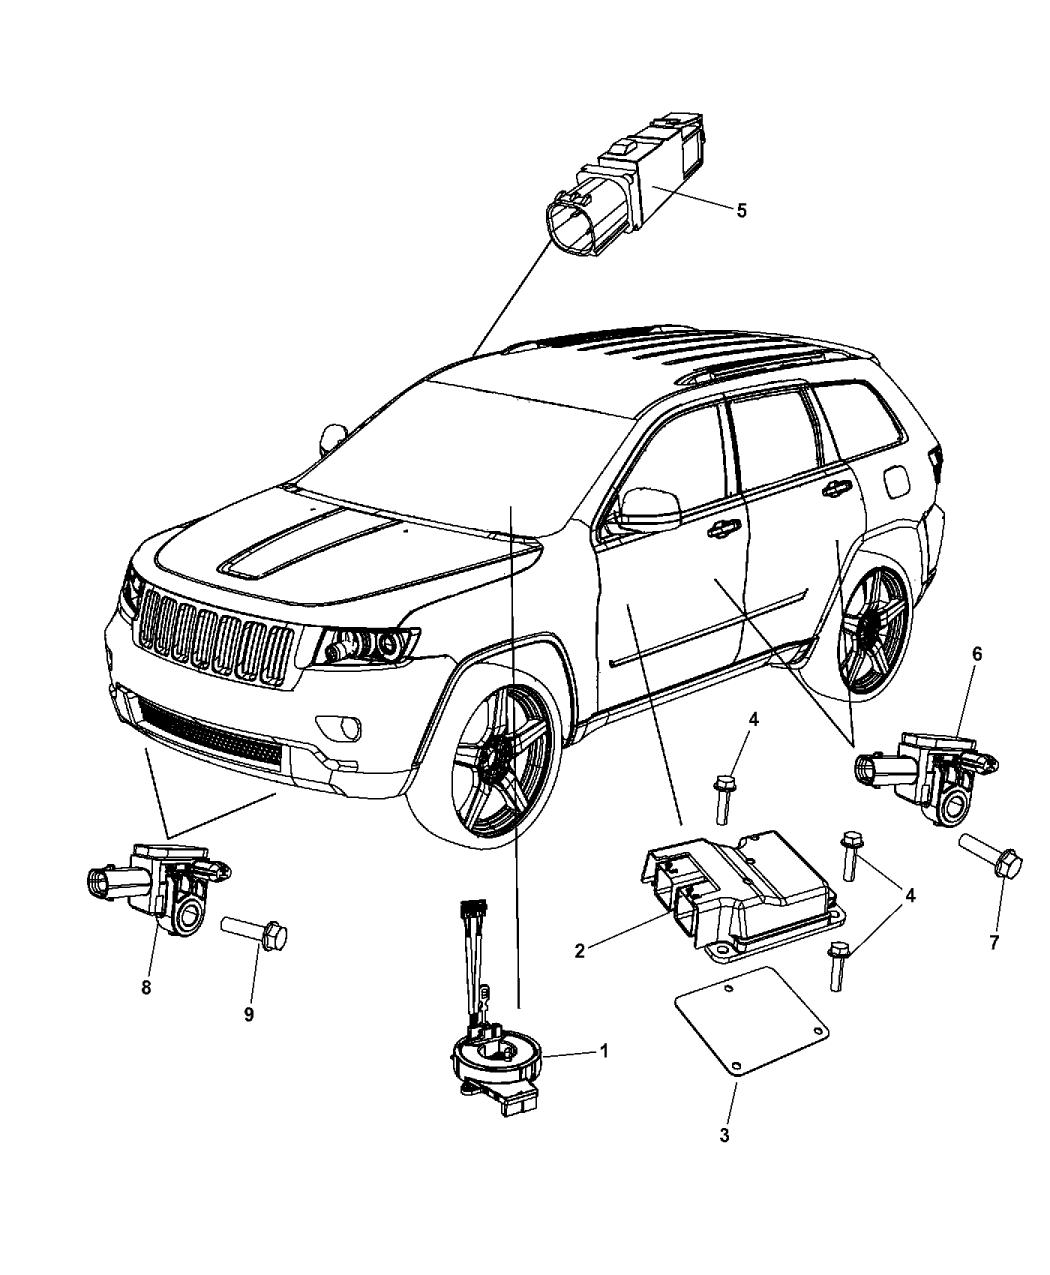 2012 Jeep Grand Cherokee Air Bag Modules Impact Sensor